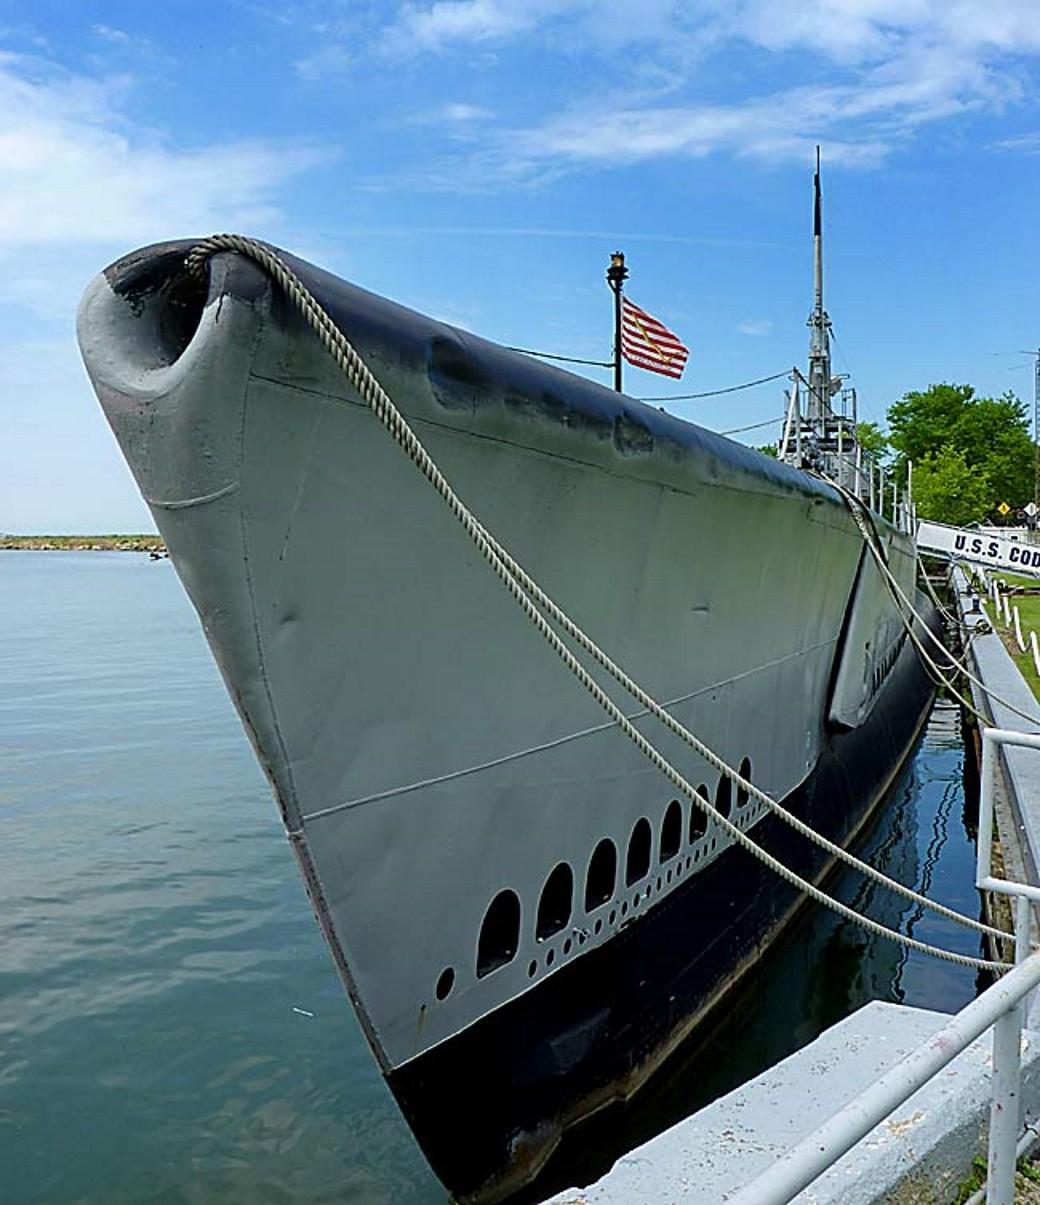 USS Cod - Περιήγηση